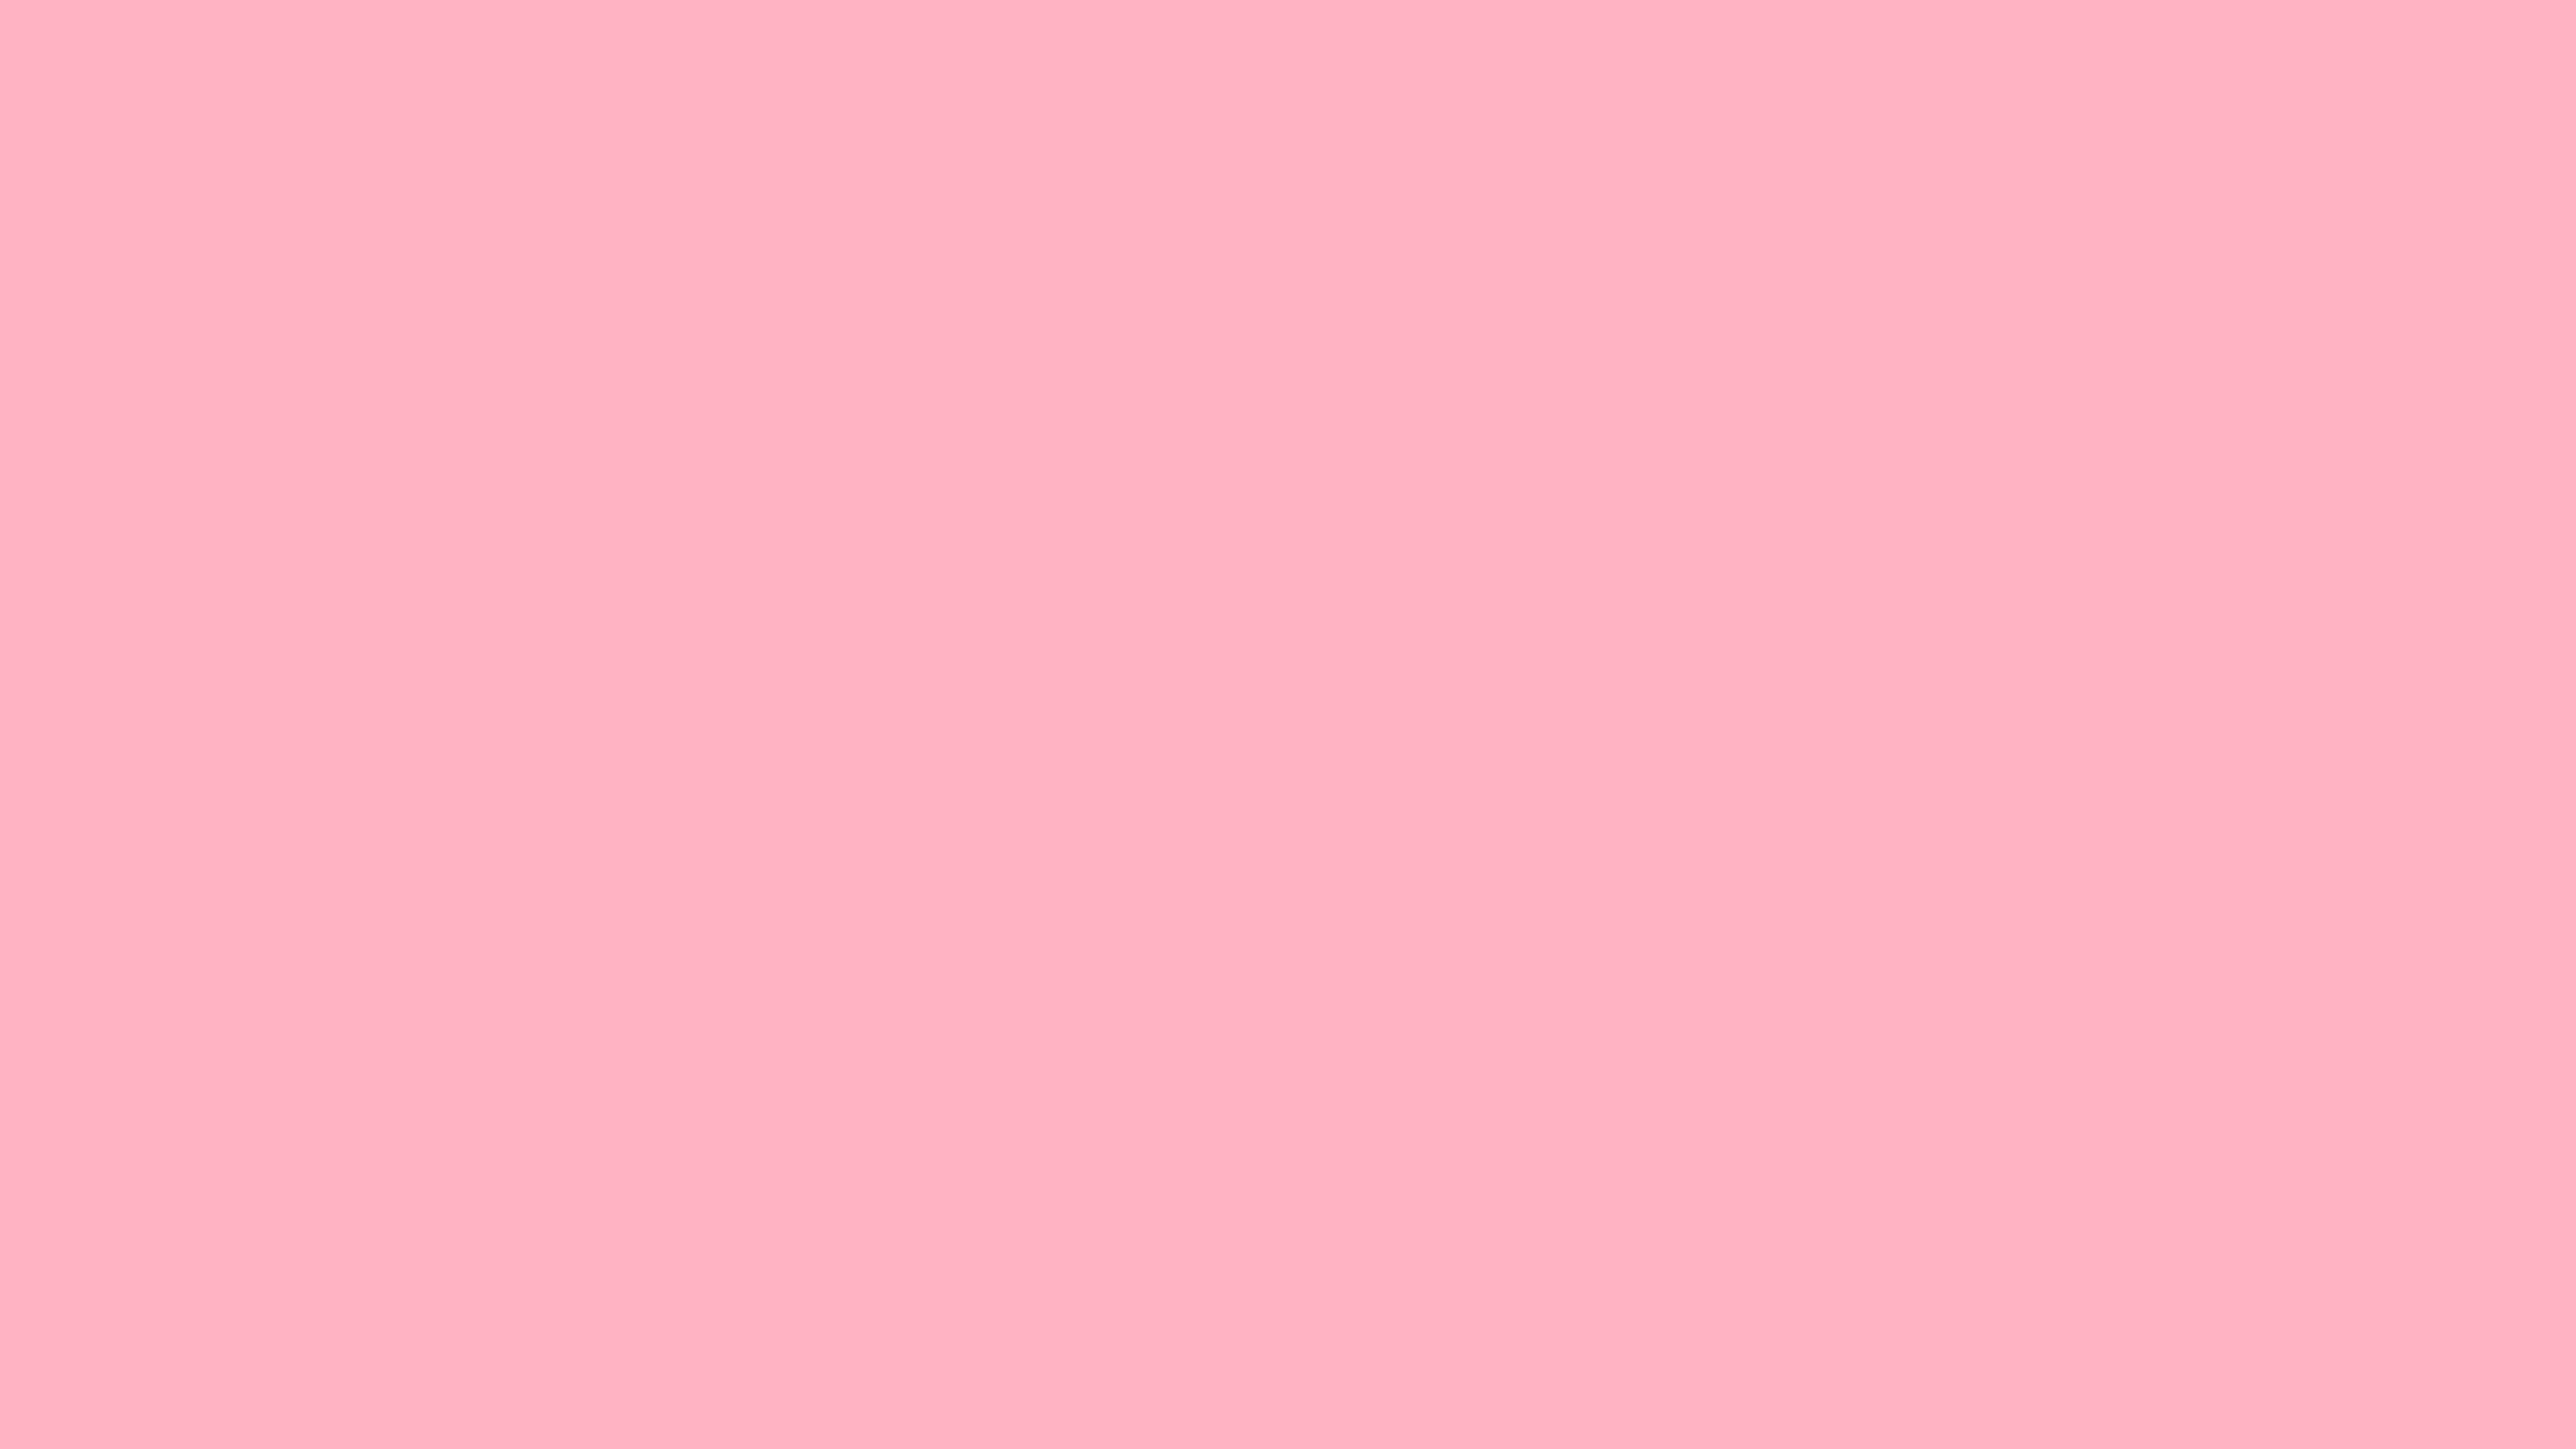 4096x2304 Light Pink Solid Color Background